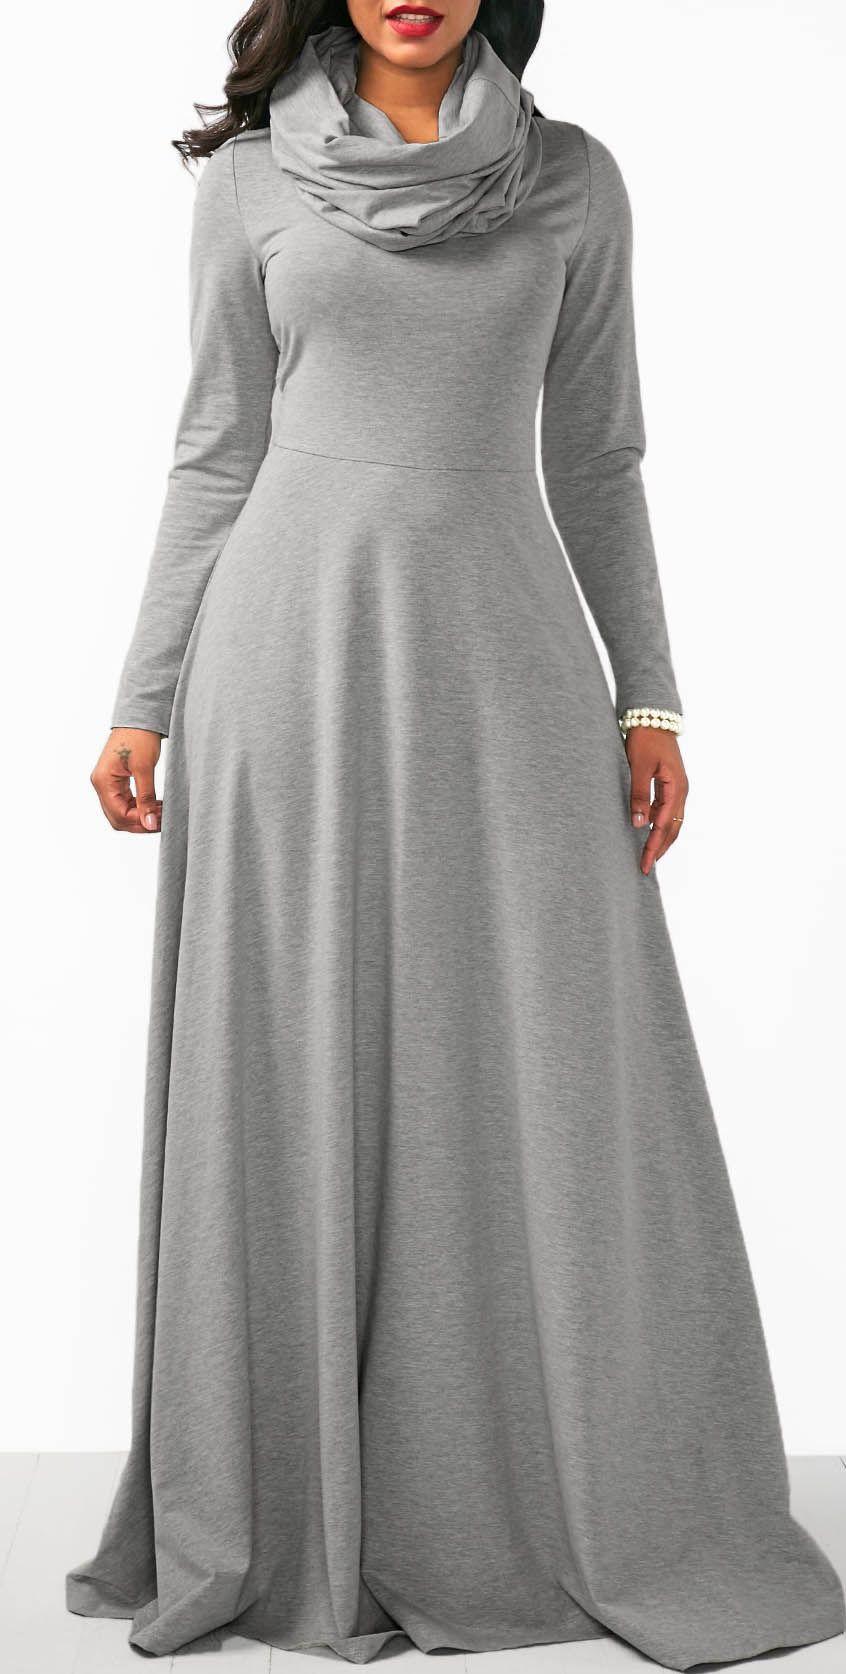 Grey cowl neck long sleeve maxi dress long sleeve maxi cowl neck